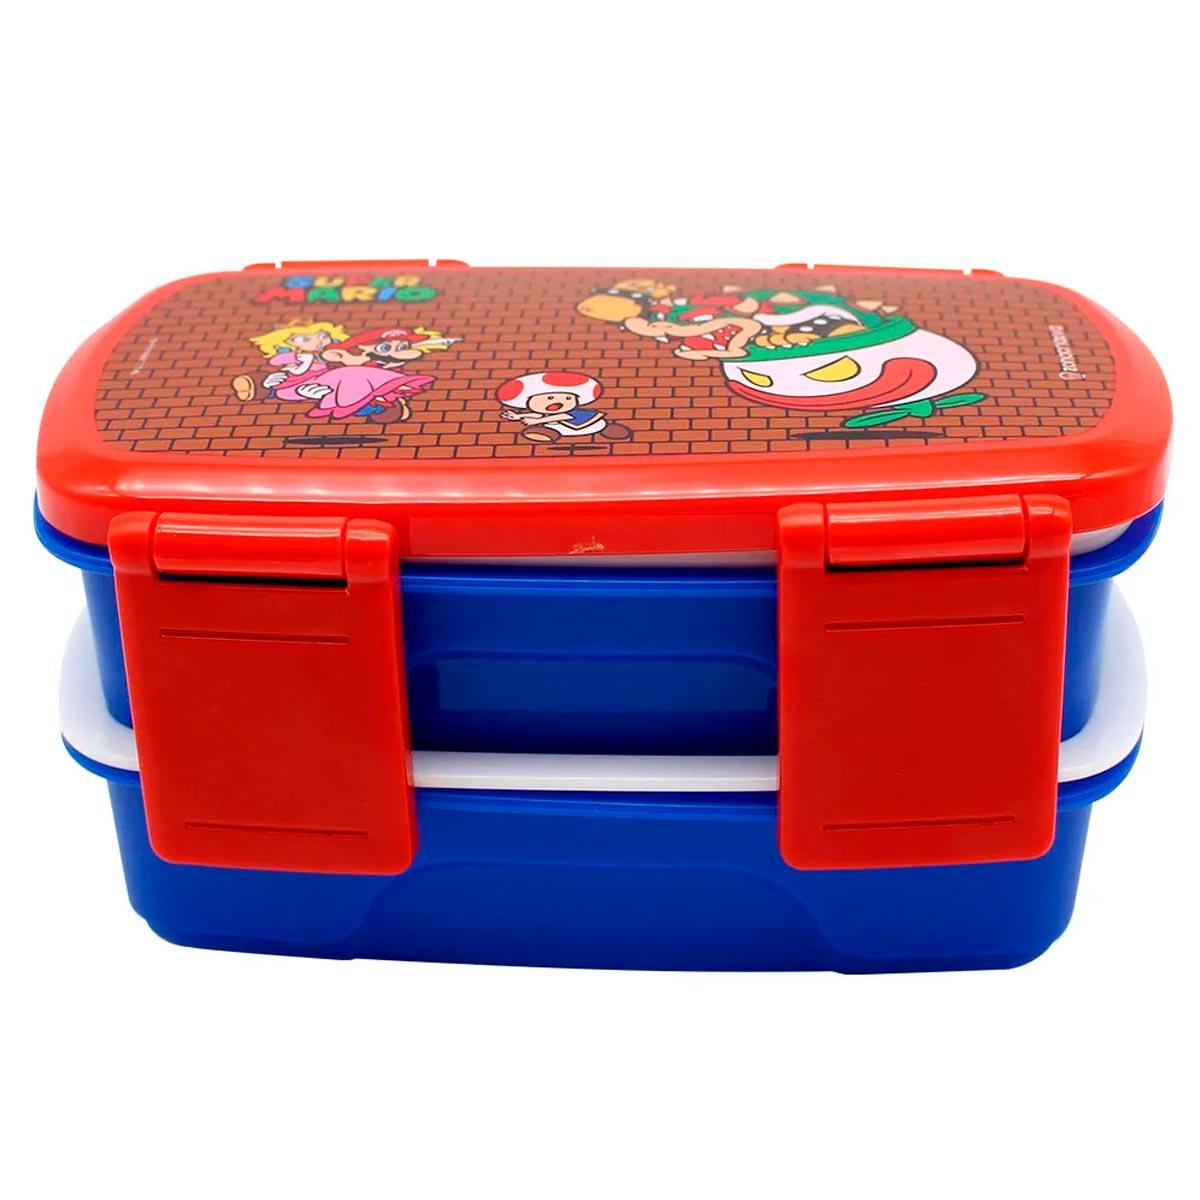 Marmita Lancheira com Talheres Super Mario 750 ml - Presente Super